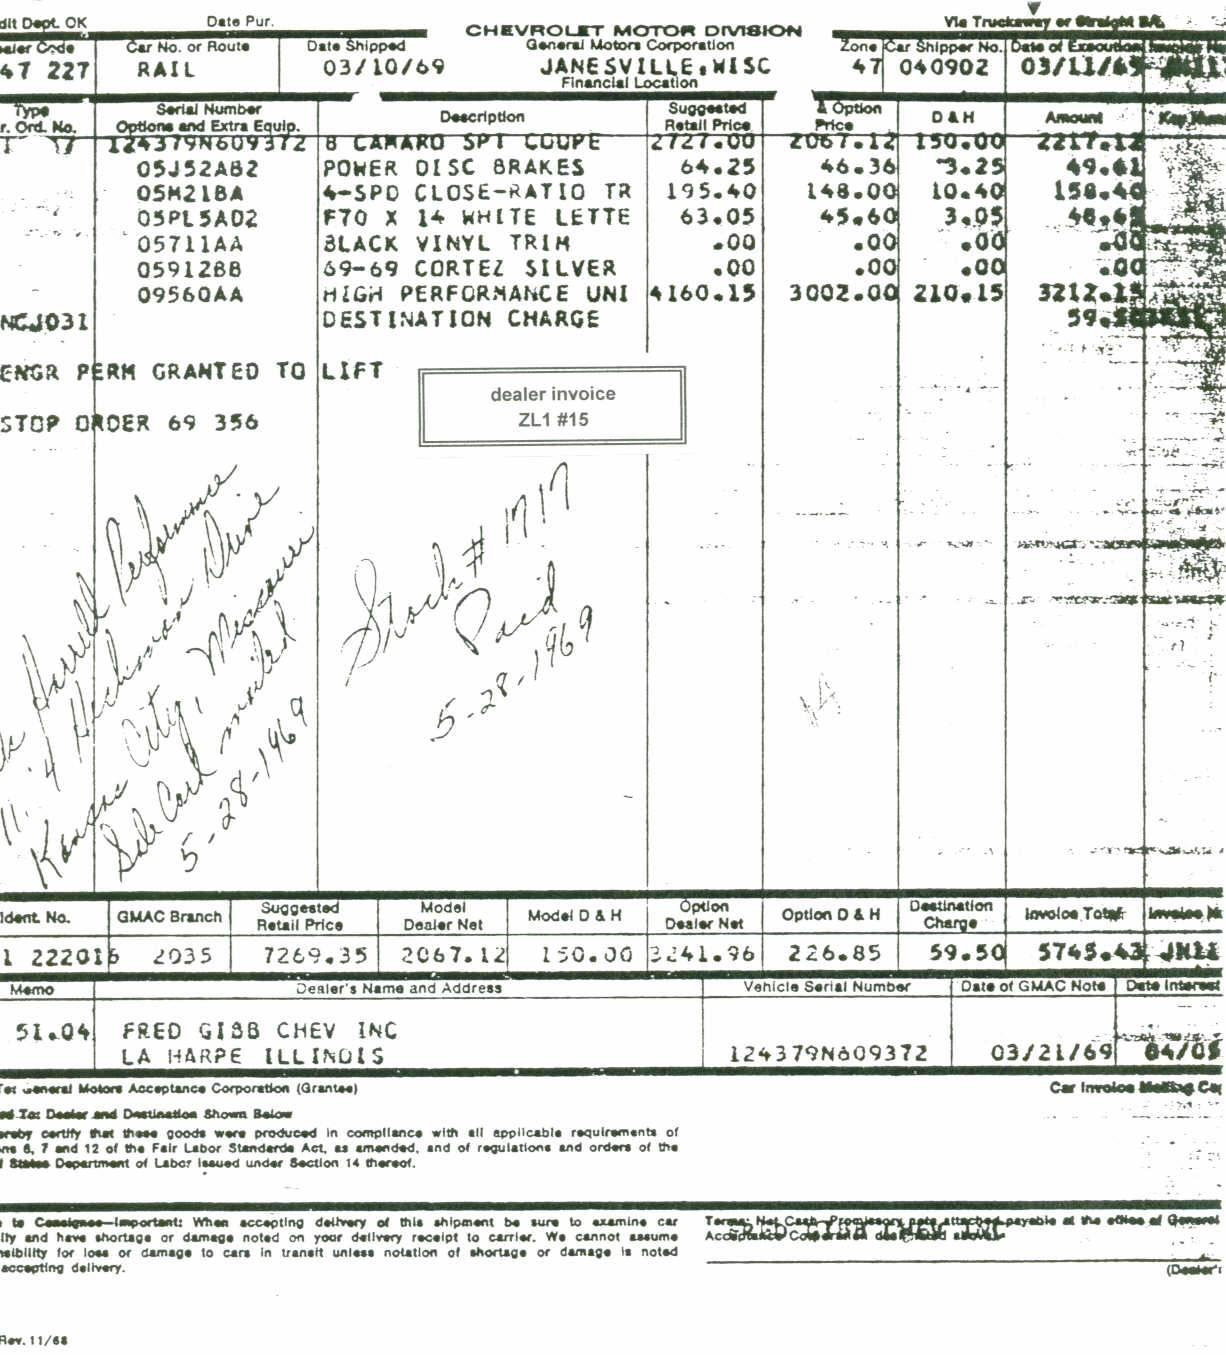 CRG Research Report COPO - Gm dealer invoice price